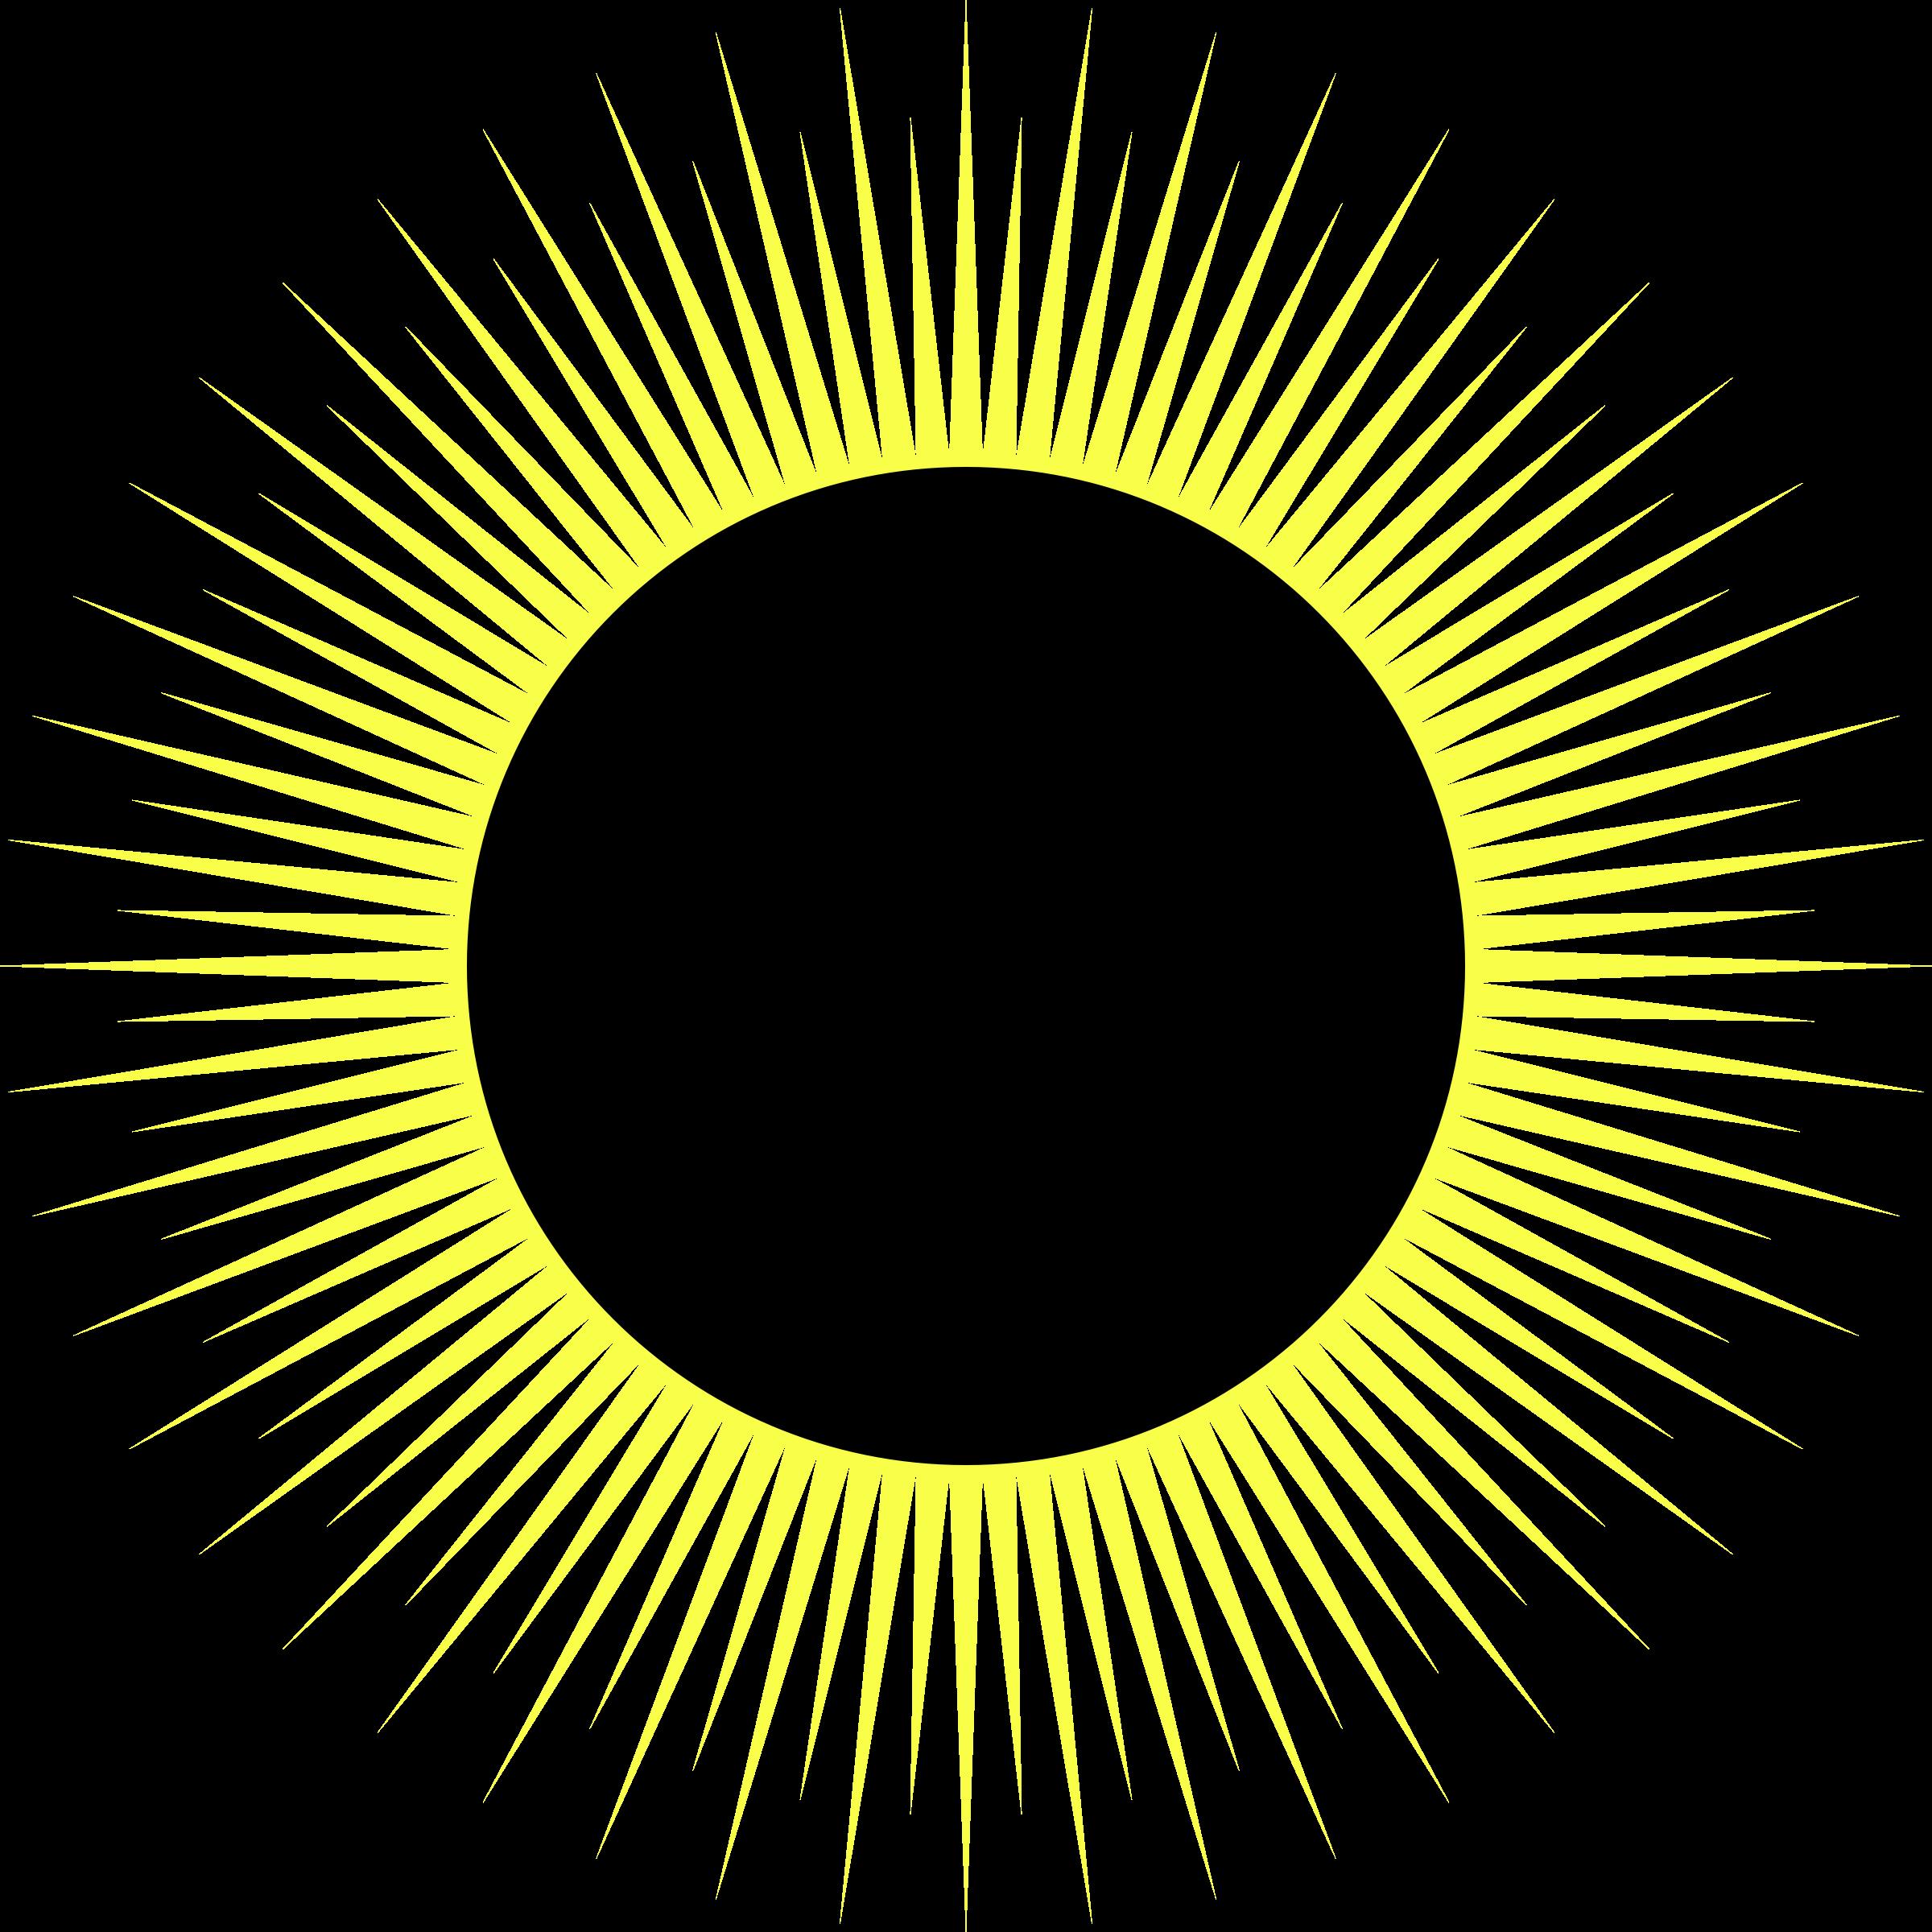 Eclipse transparent